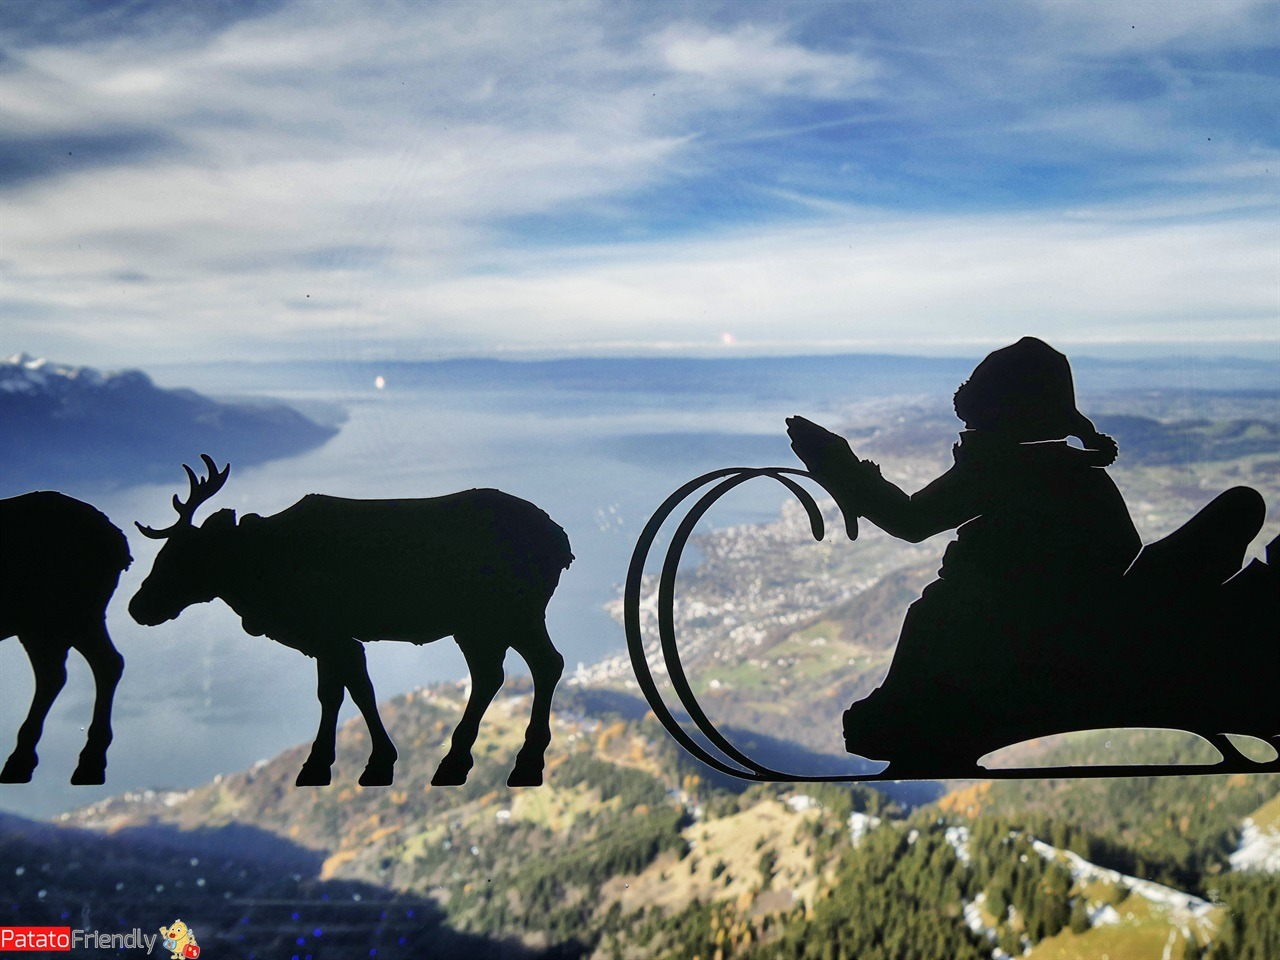 [cml_media_alt id='12967']Natale a Montreux coi bambini - La Casa di Babbo Natale[/cml_media_alt]